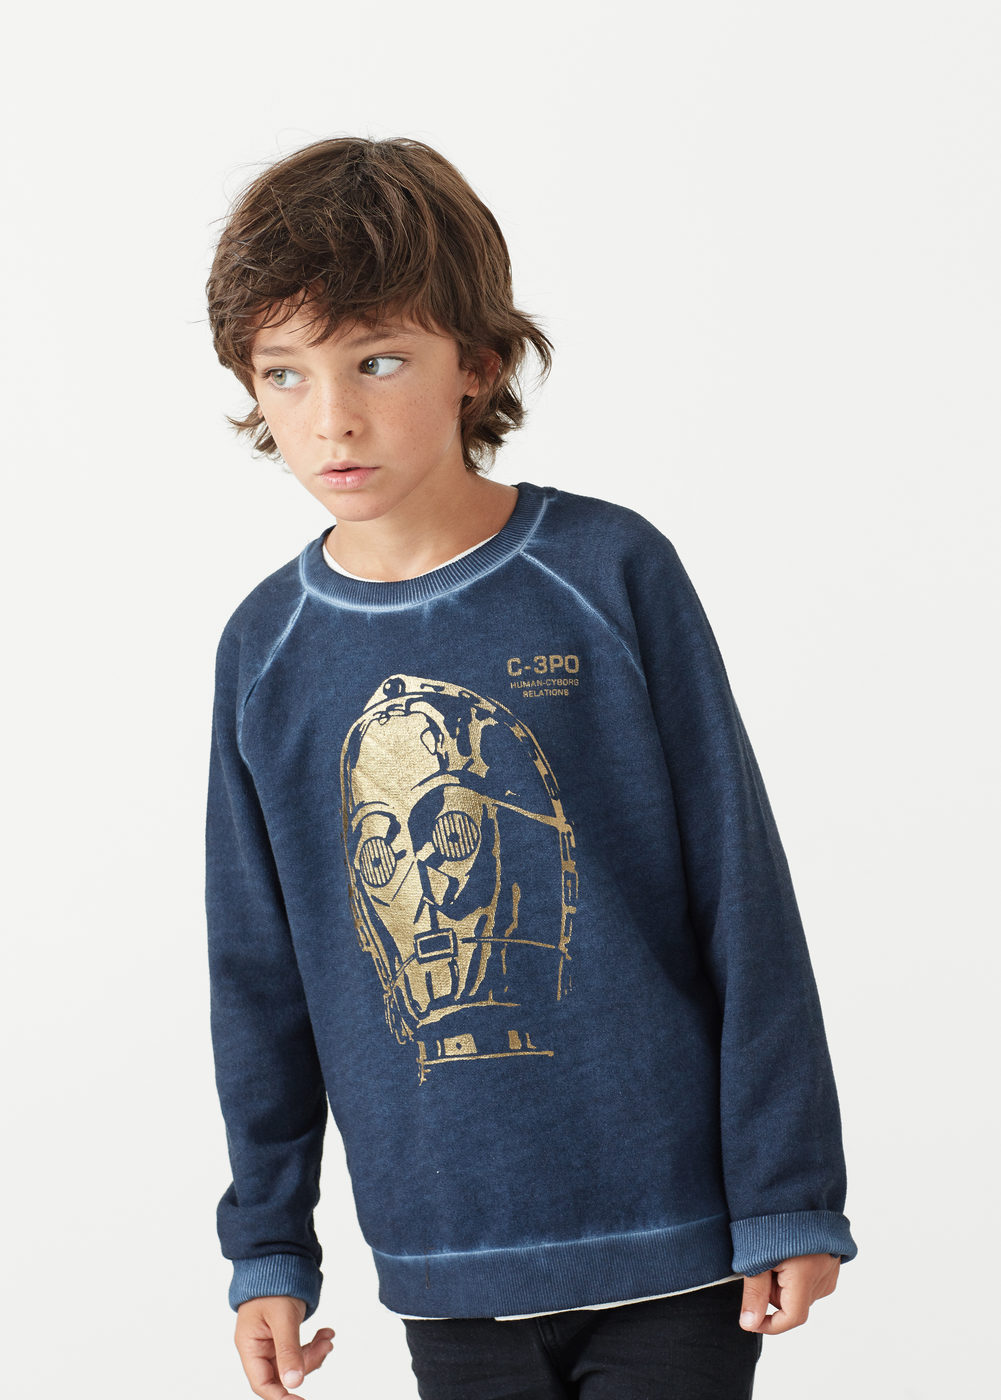 Cool Boys Star Wars Sweatshirts And T Shirts Little